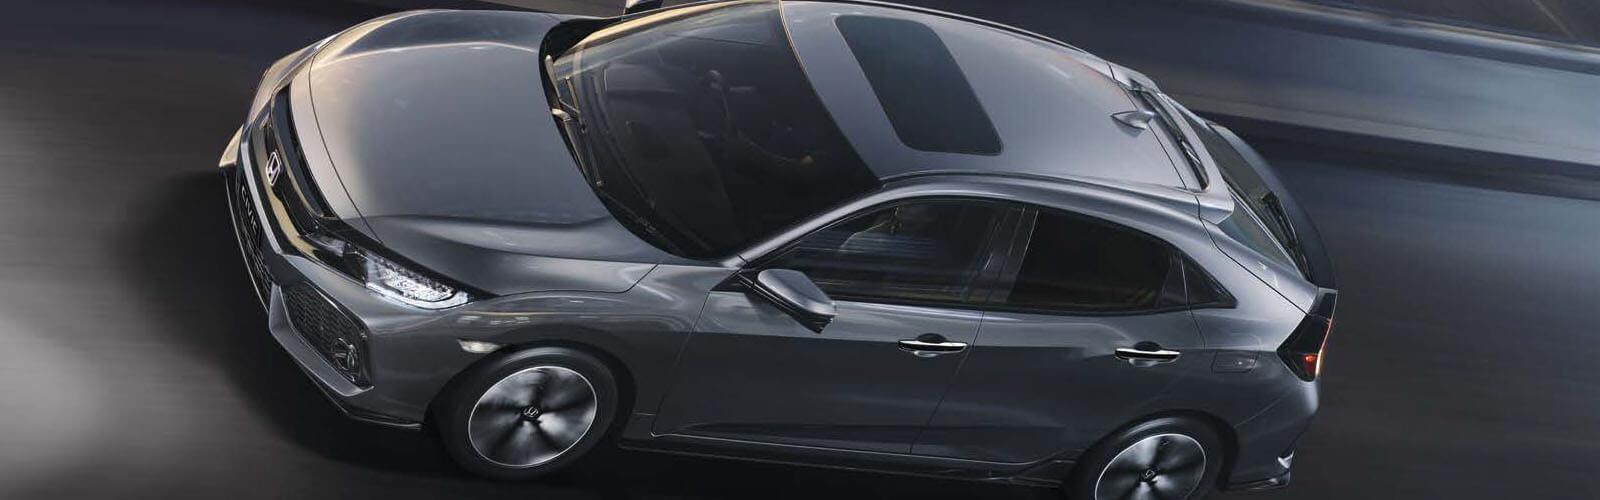 New Honda Civic Hatch For Sale In Brisbane Northside Torque Honda